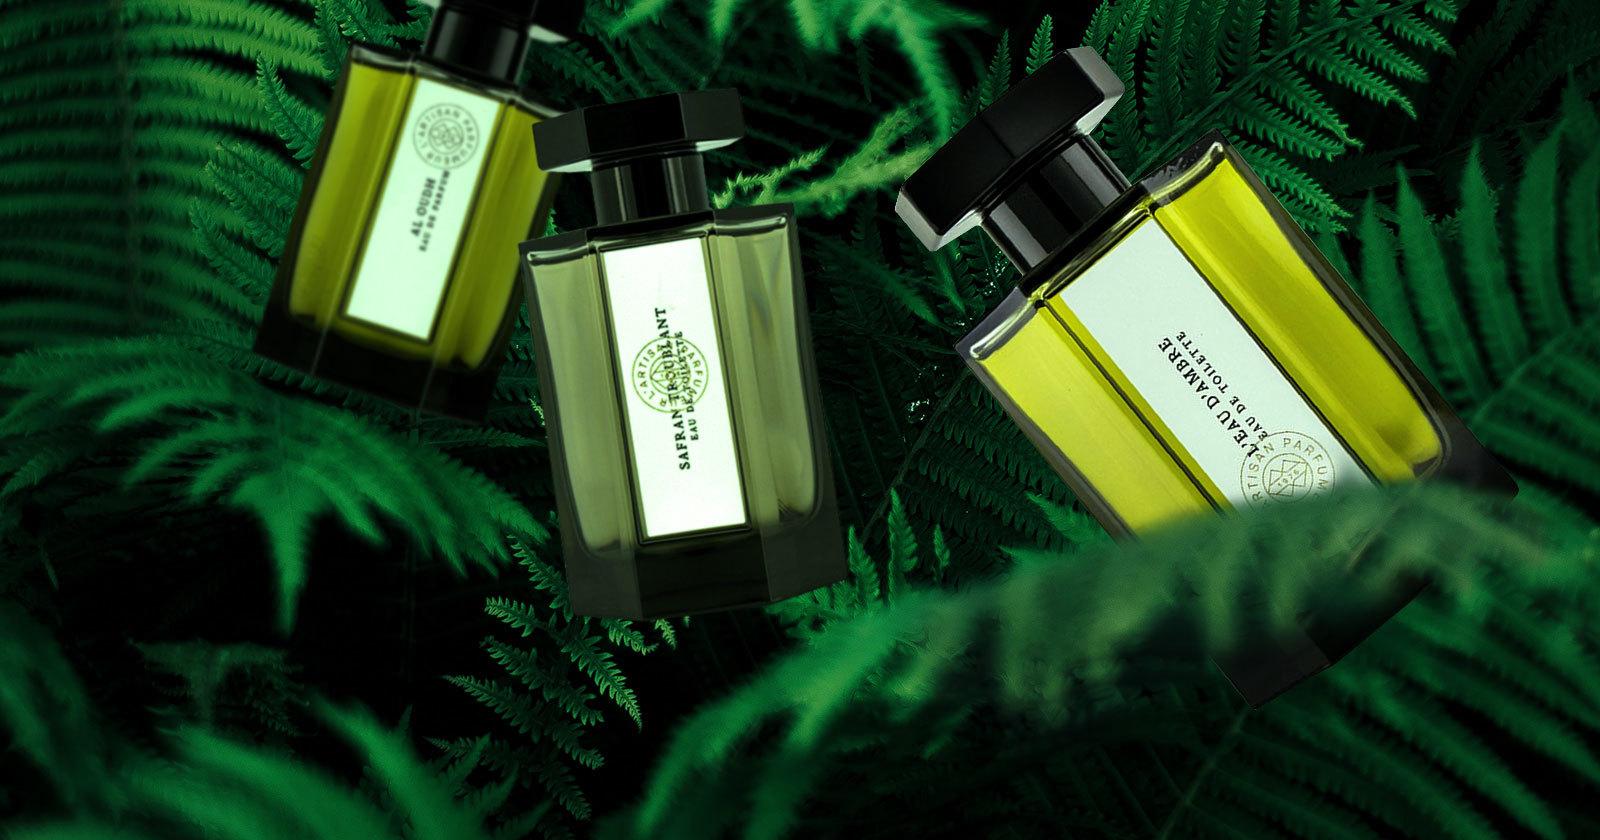 L'Artisan Parfumeur 阿蒂仙之香